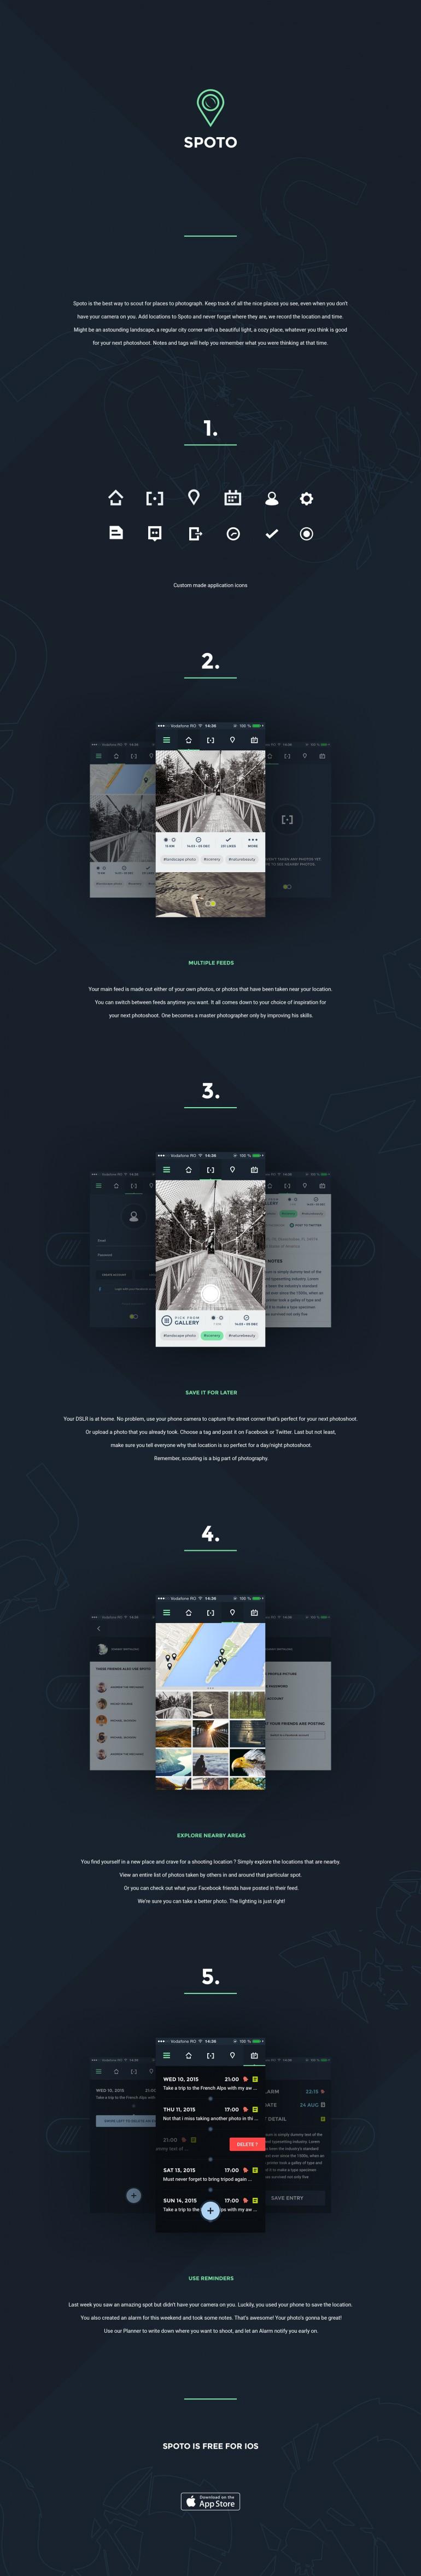 Spoto iOS App